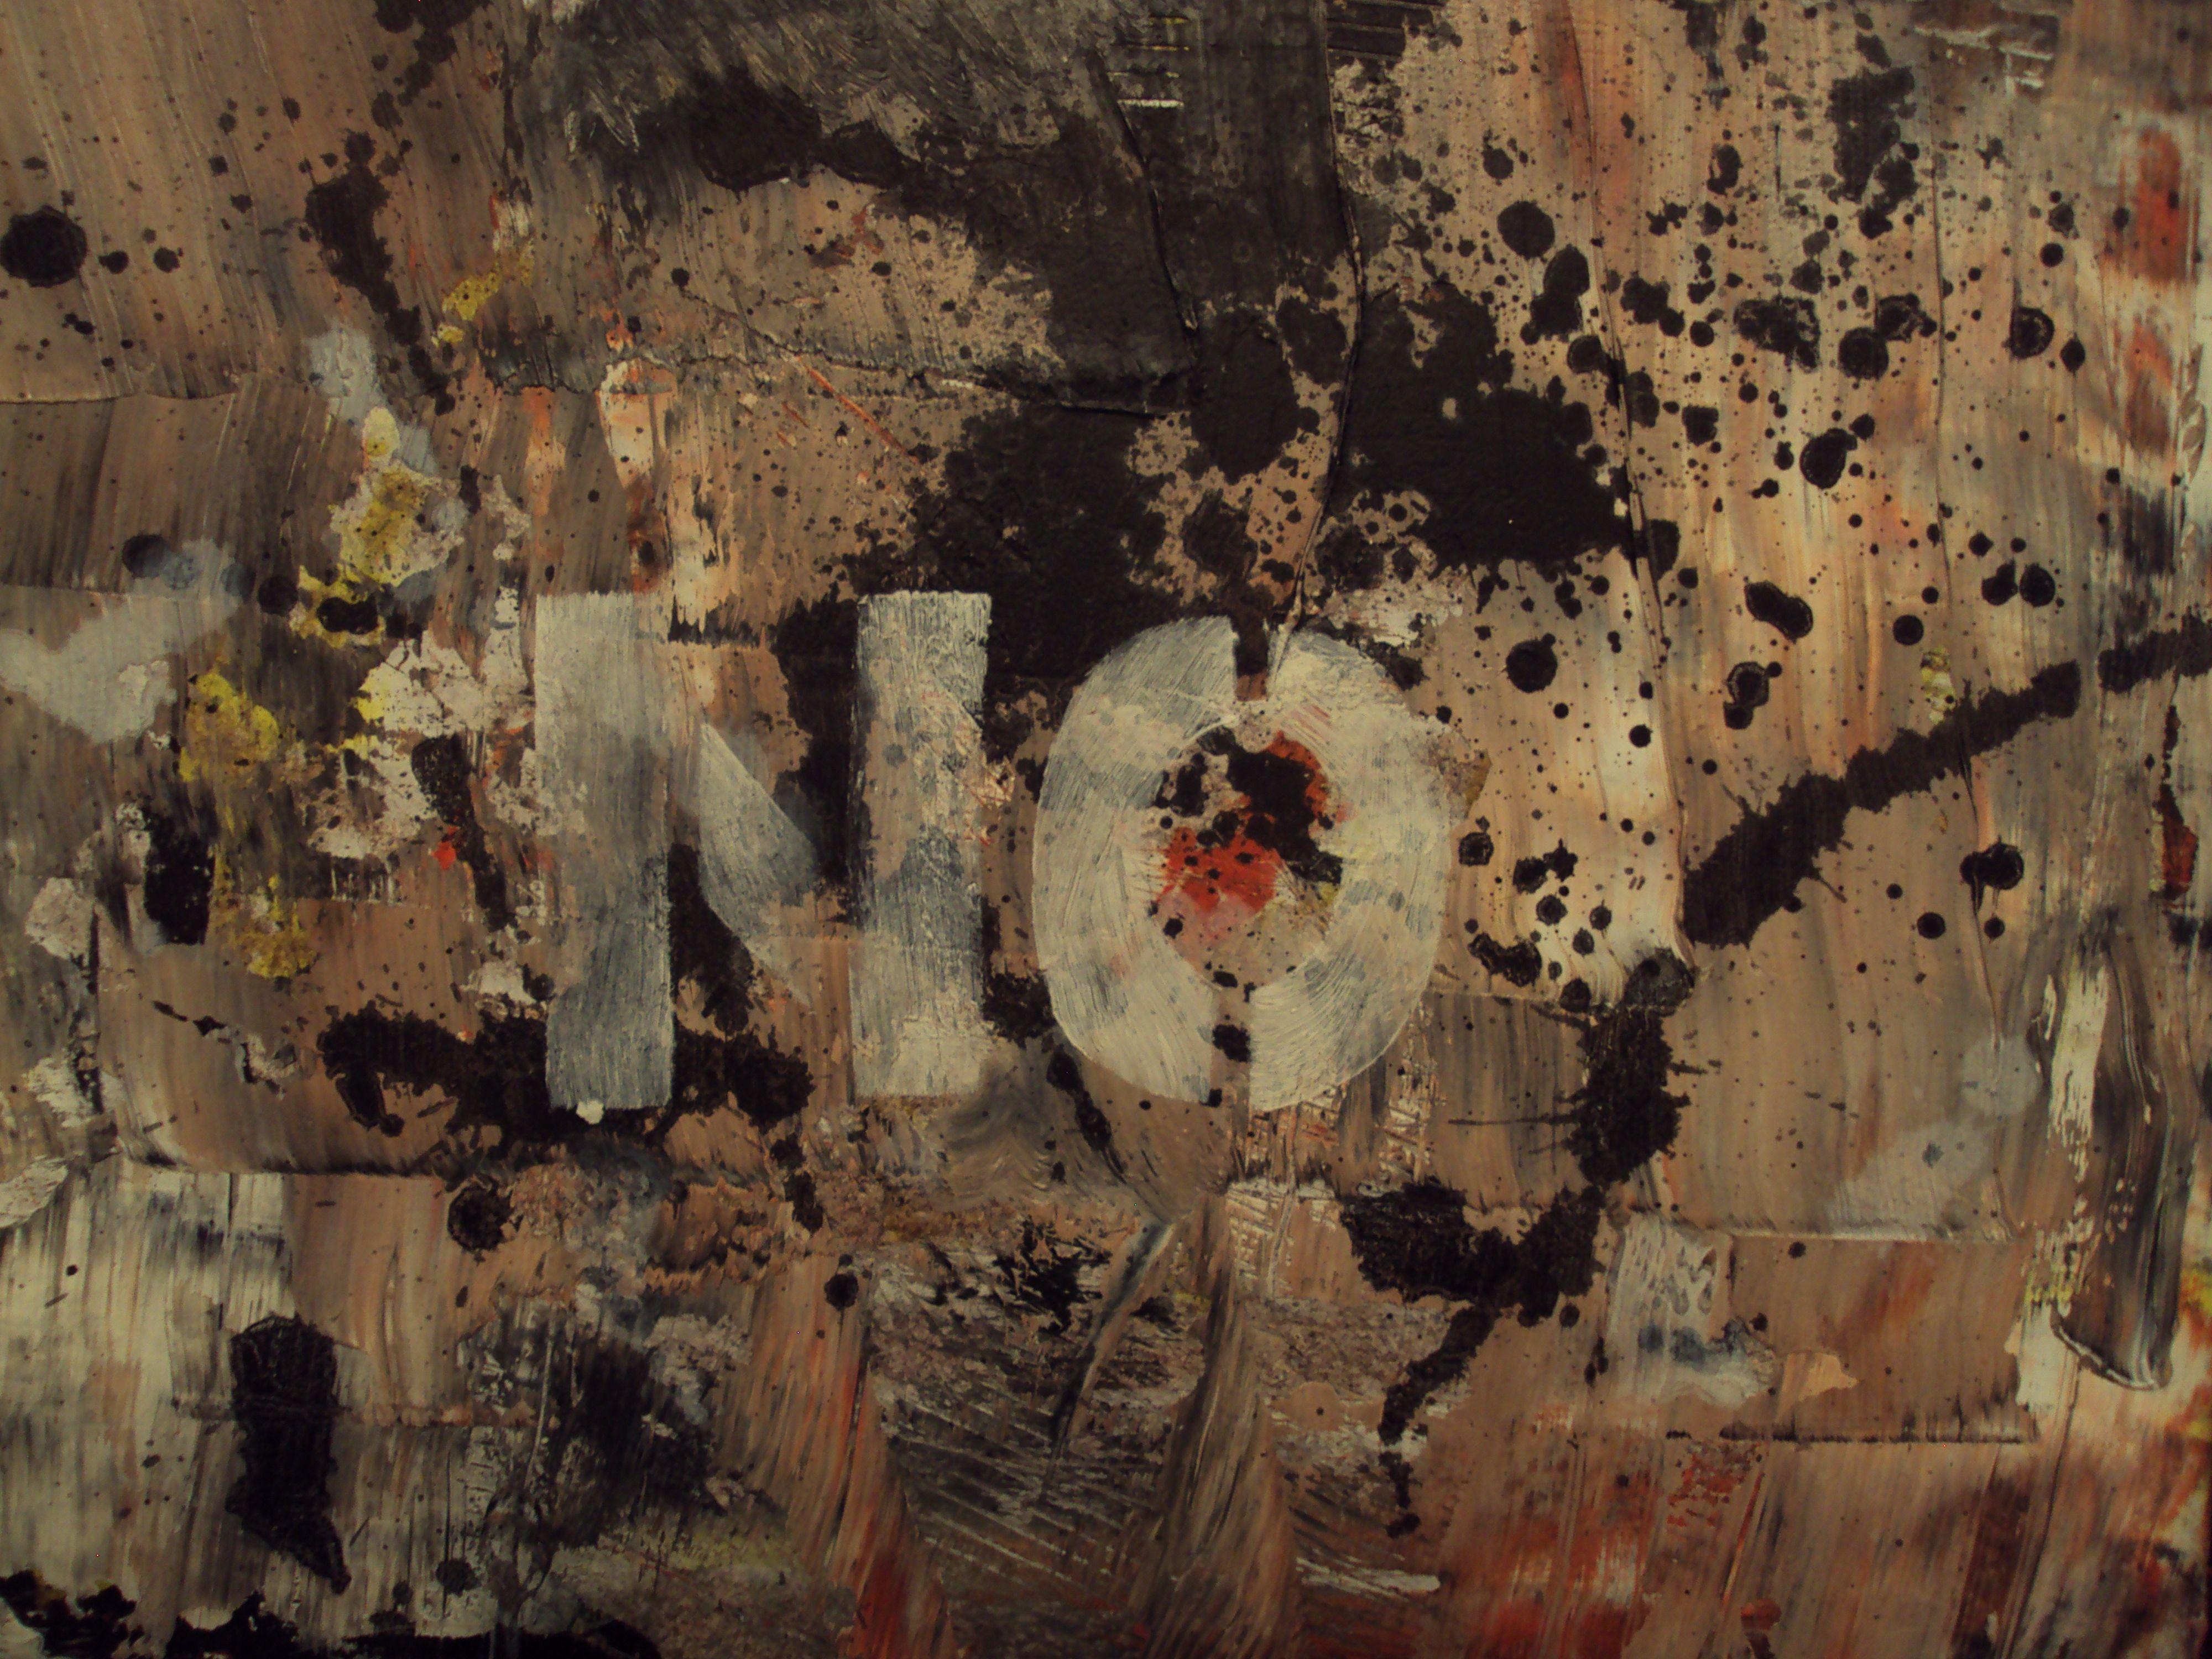 """No"", by Anastassia Smirnova"